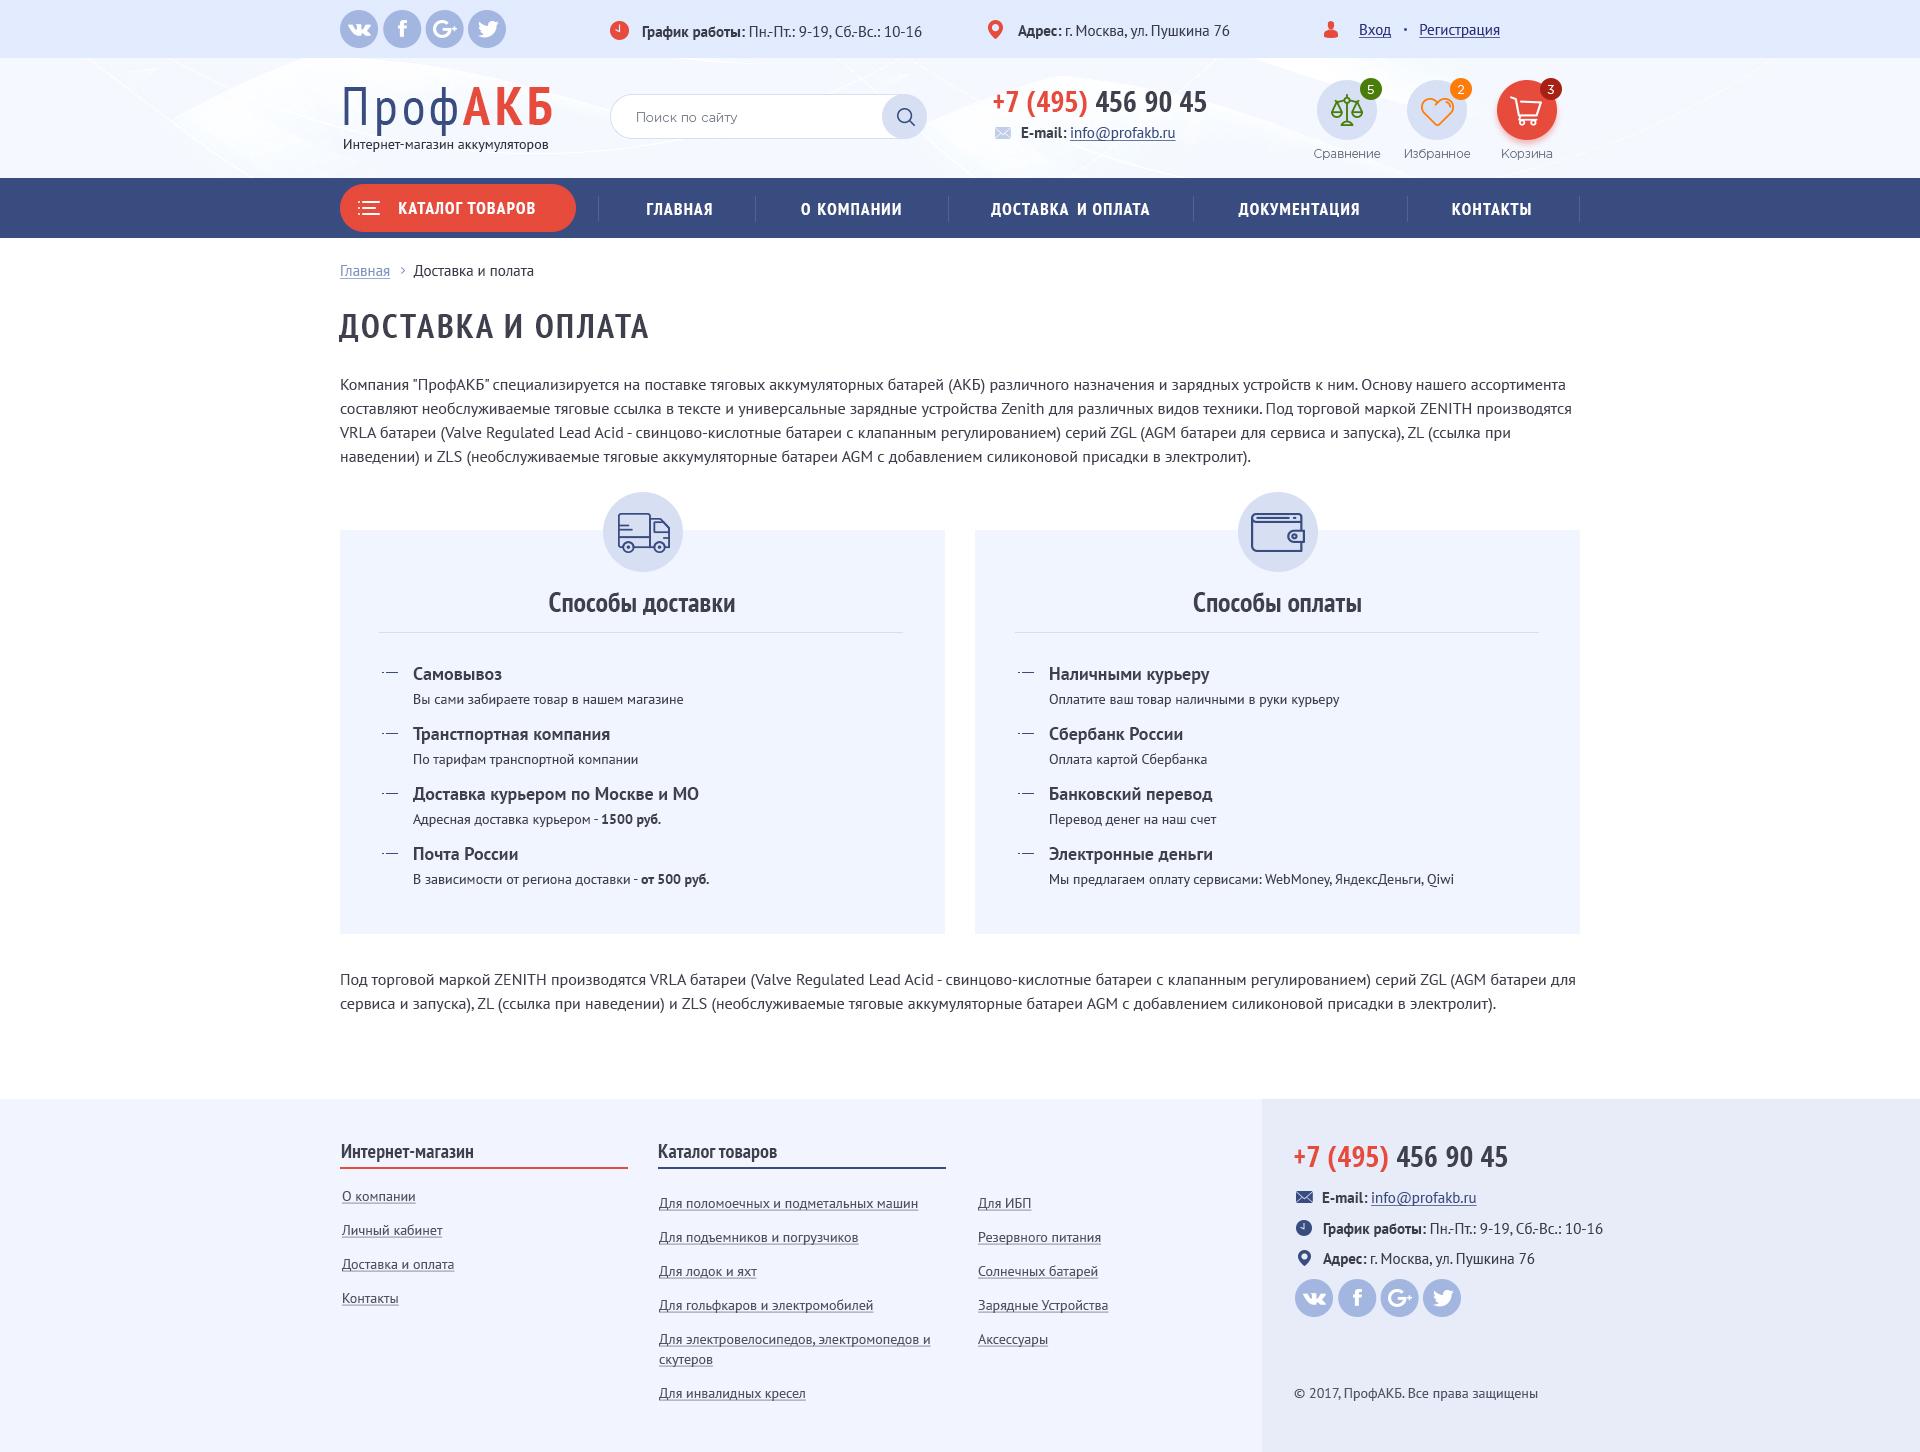 ProfAKB_dostavka_oplata